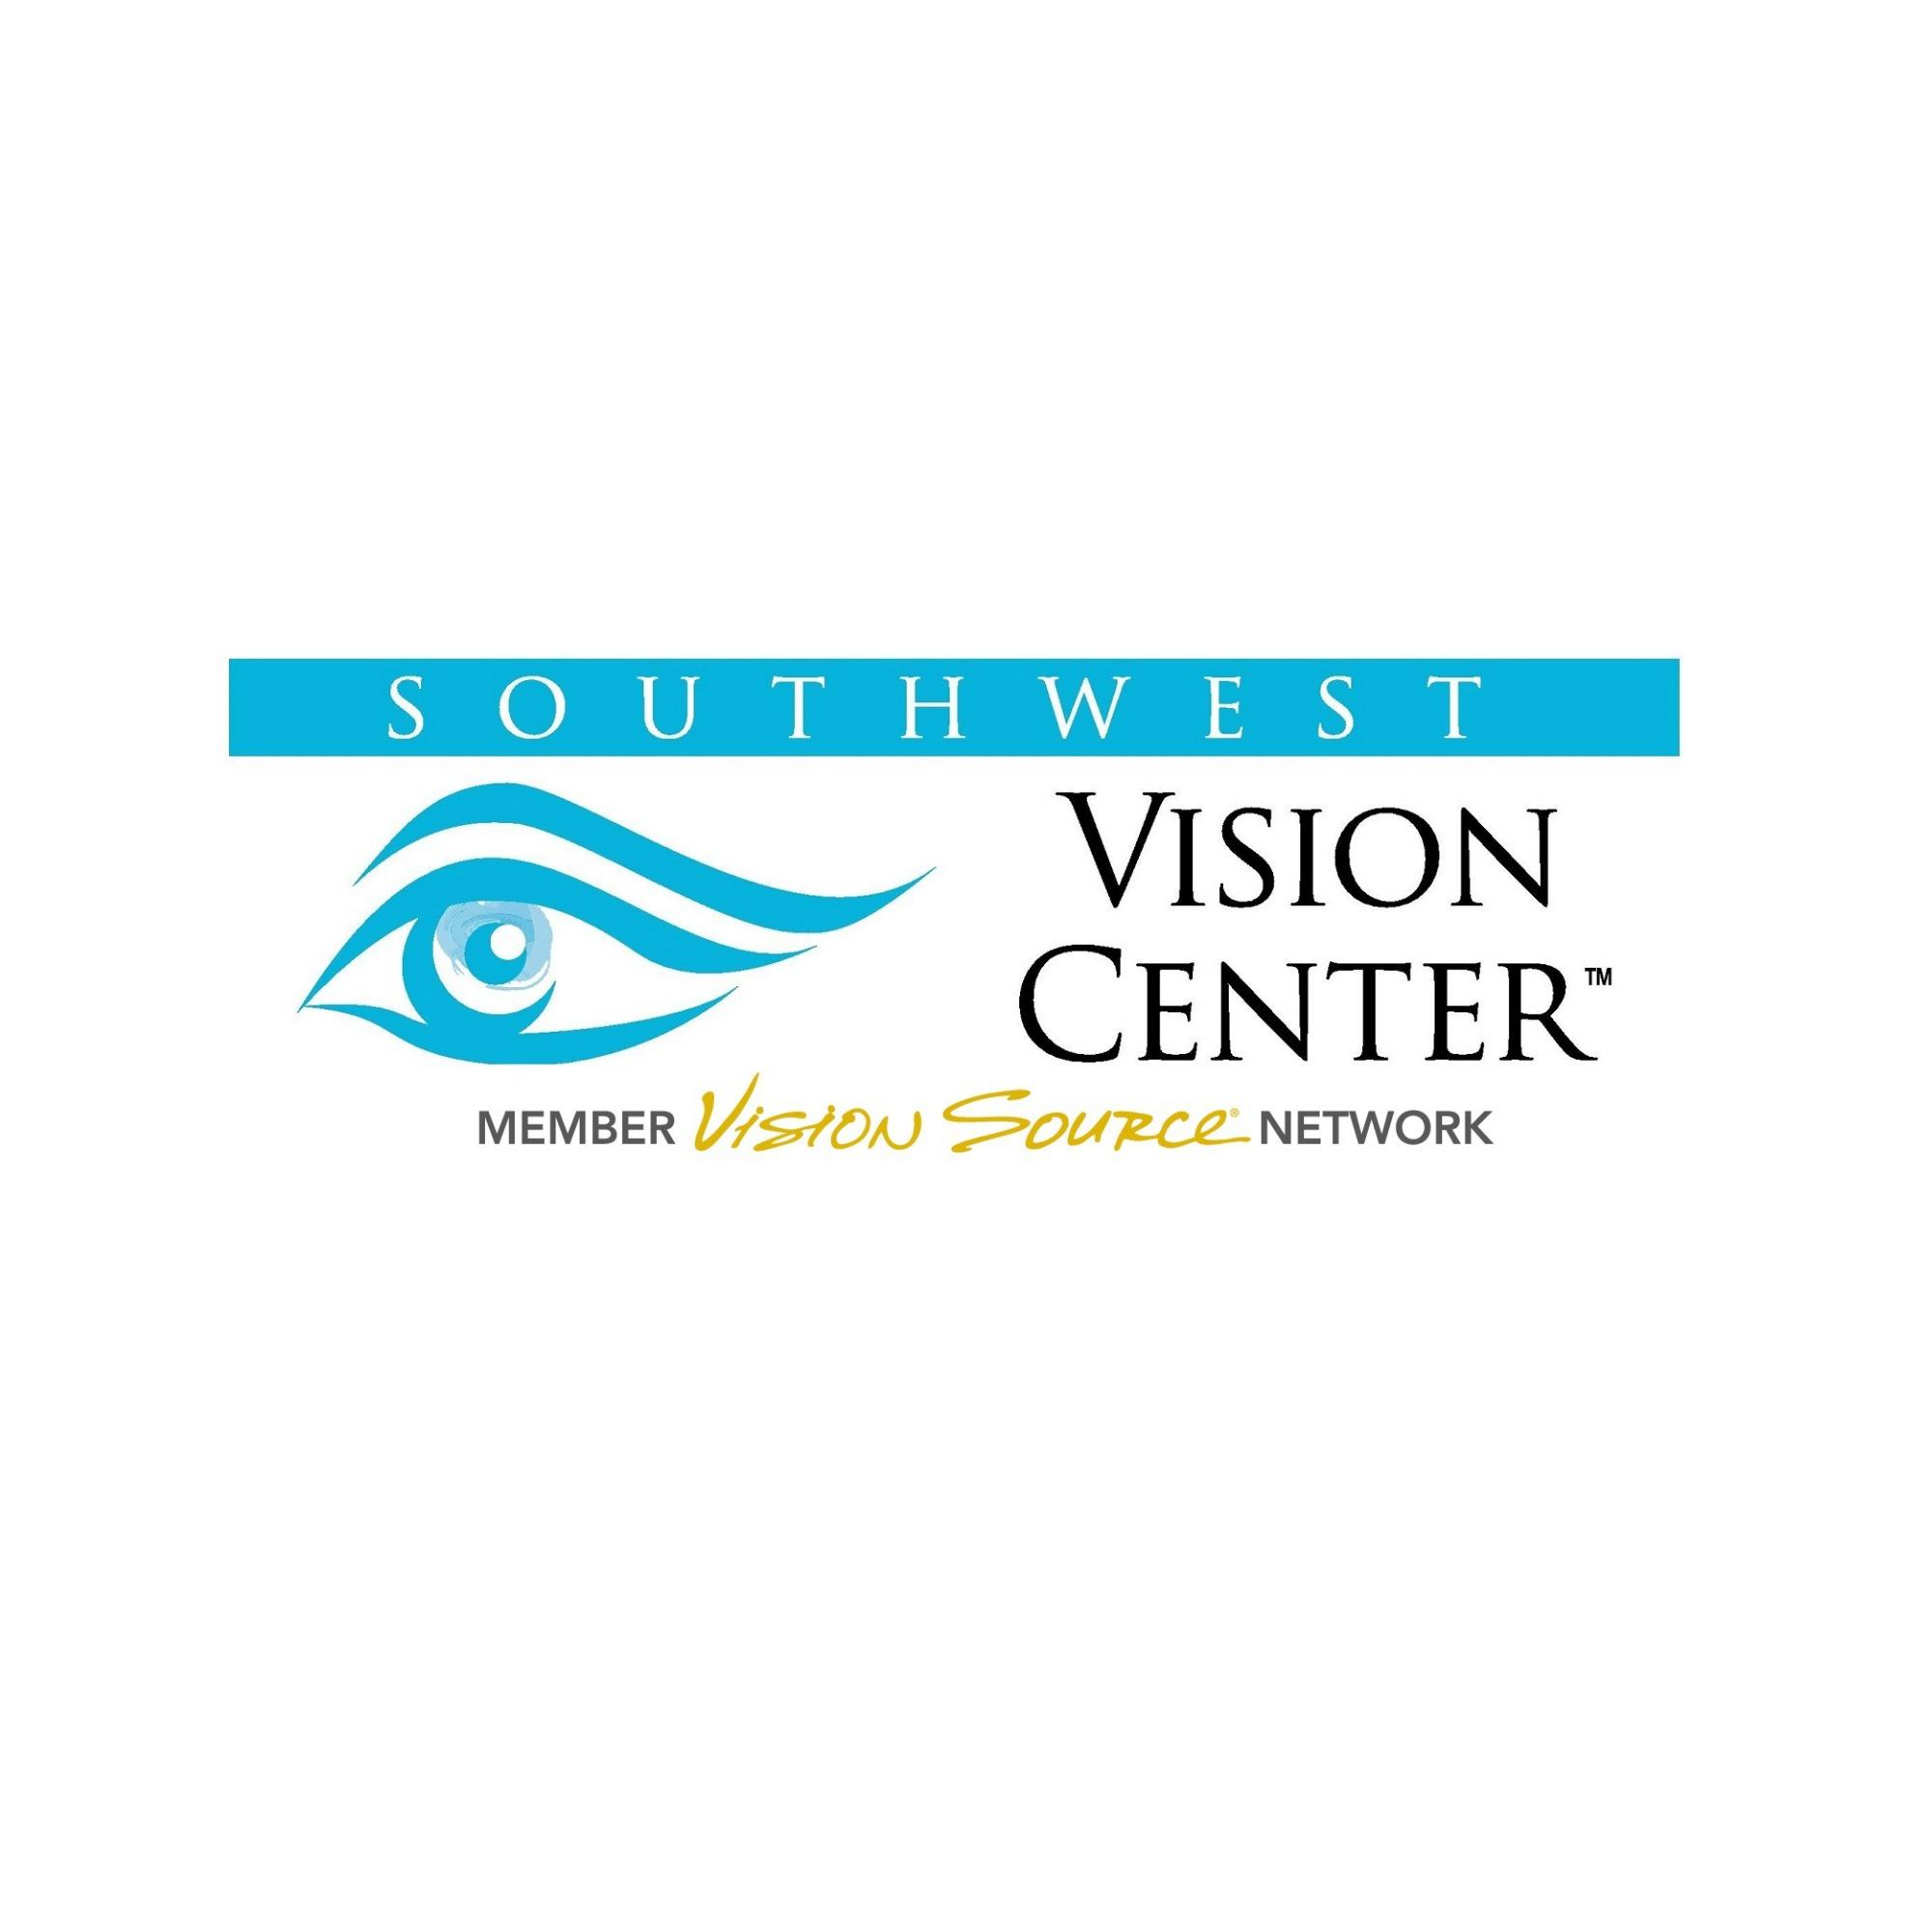 Southwest Vision Center